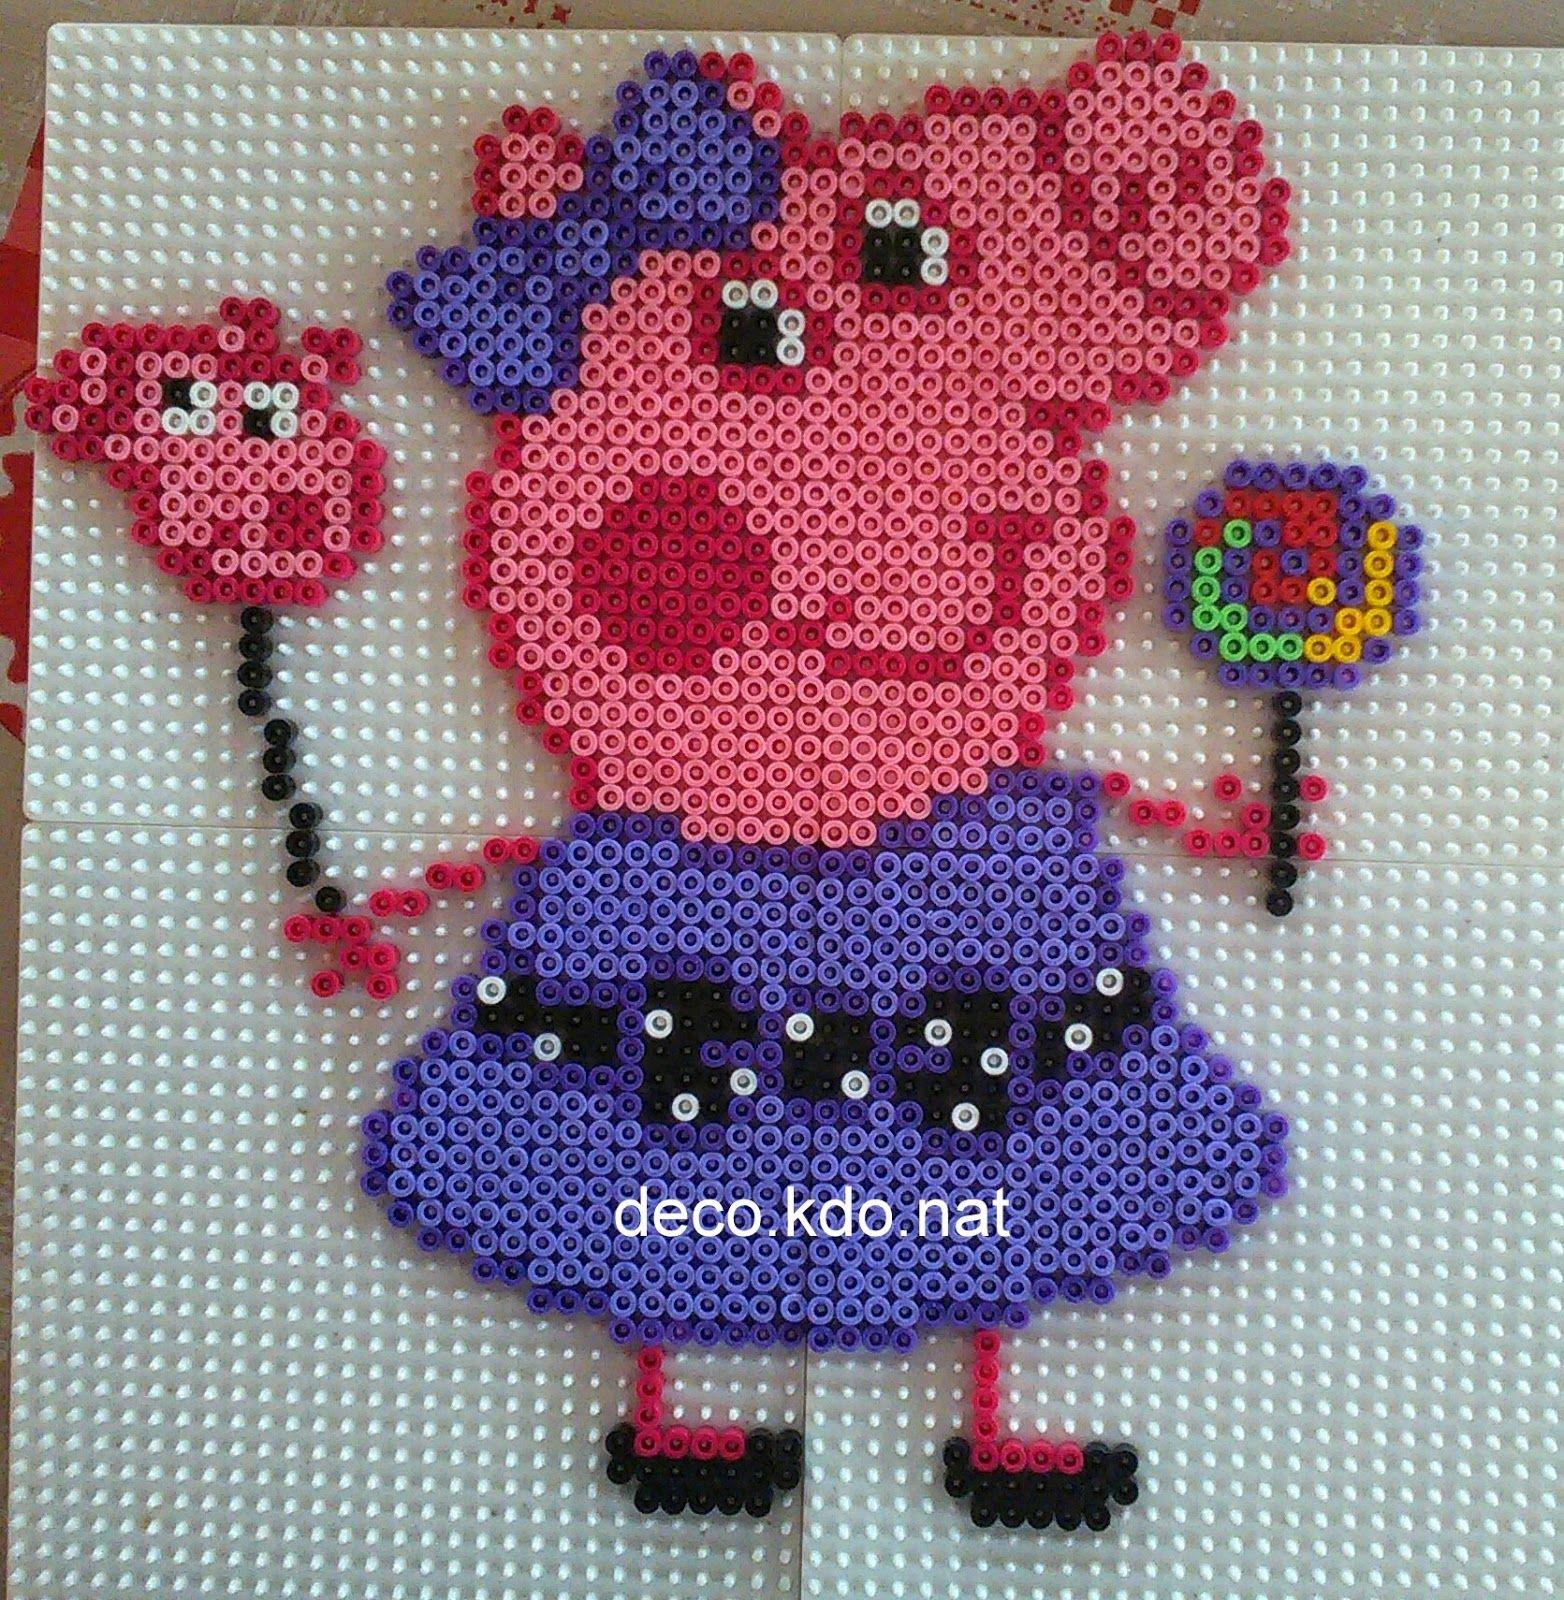 Peppa Pig hama perler beads by deco kdot